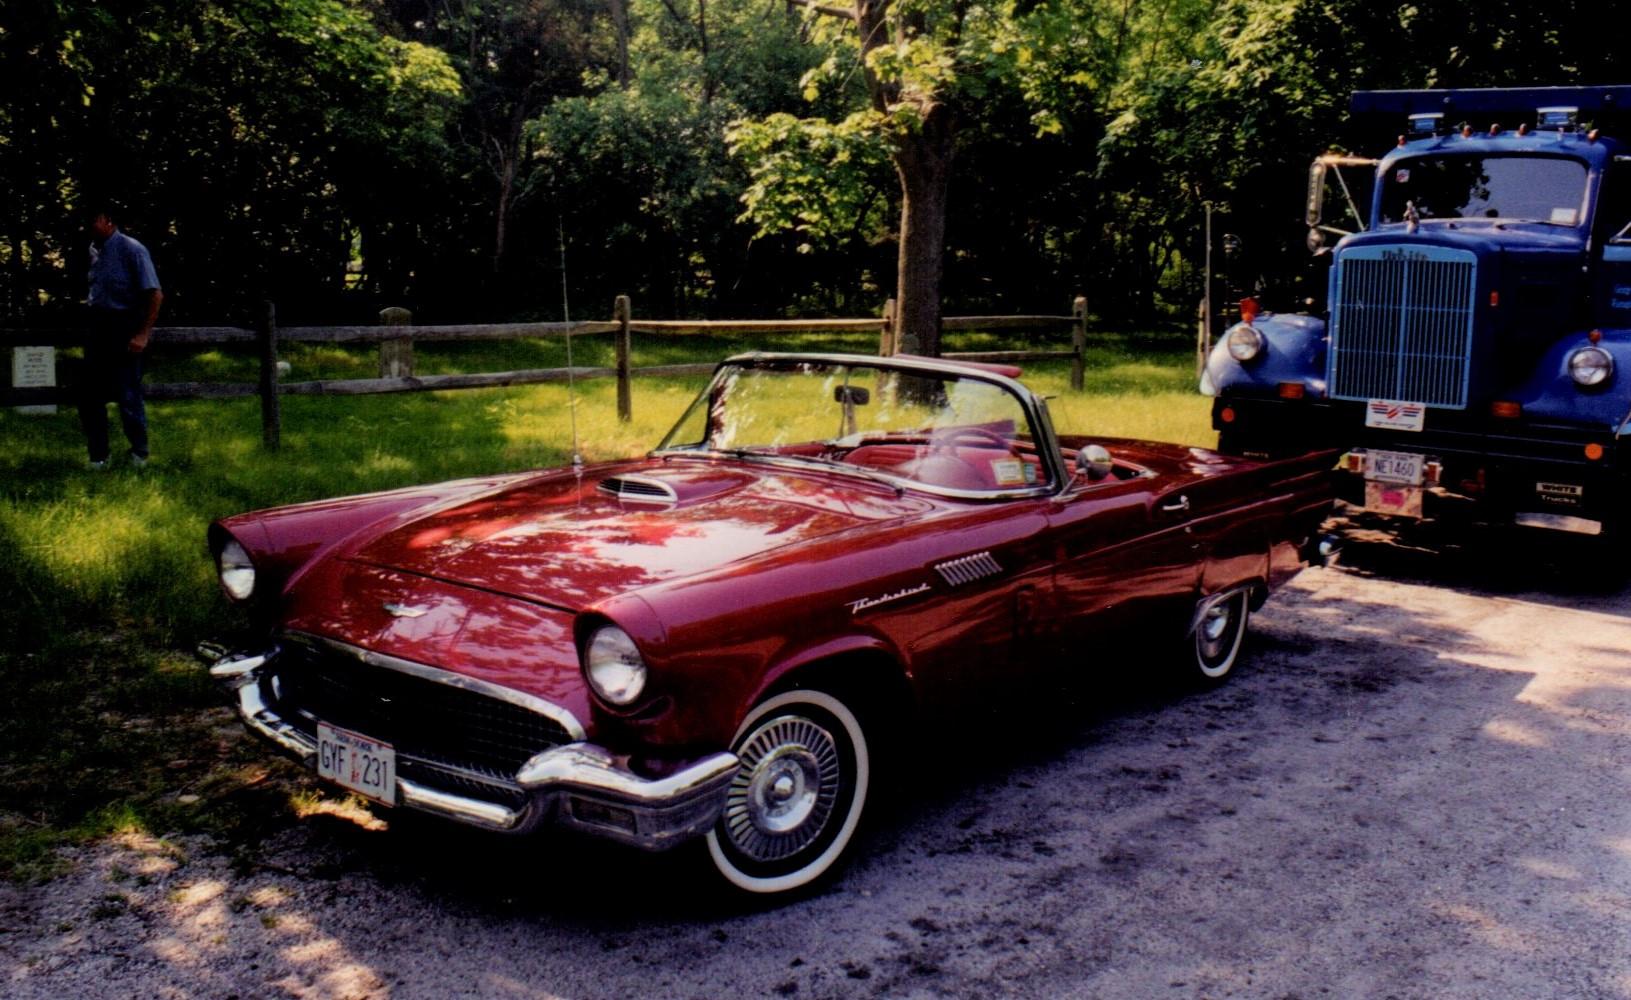 Floyd Chivvis' 1957 Thunderbird